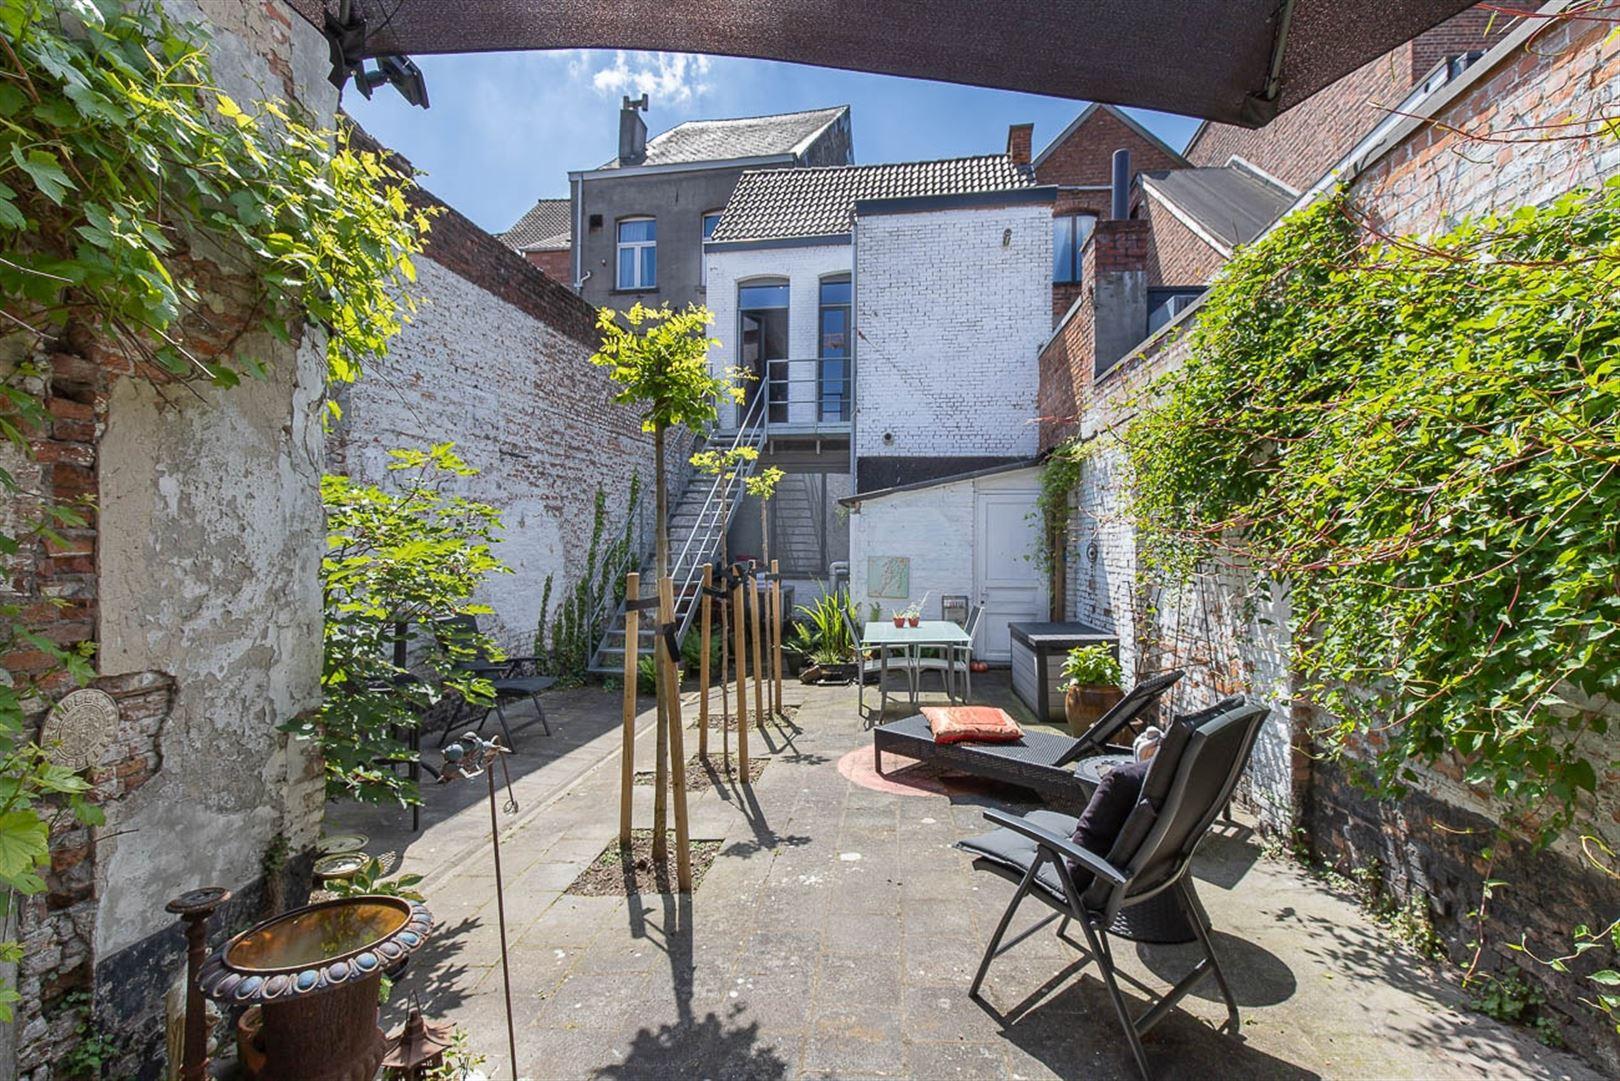 Foto 18 : Duplex/triplex te 9200 DENDERMONDE (België) - Prijs € 495.000